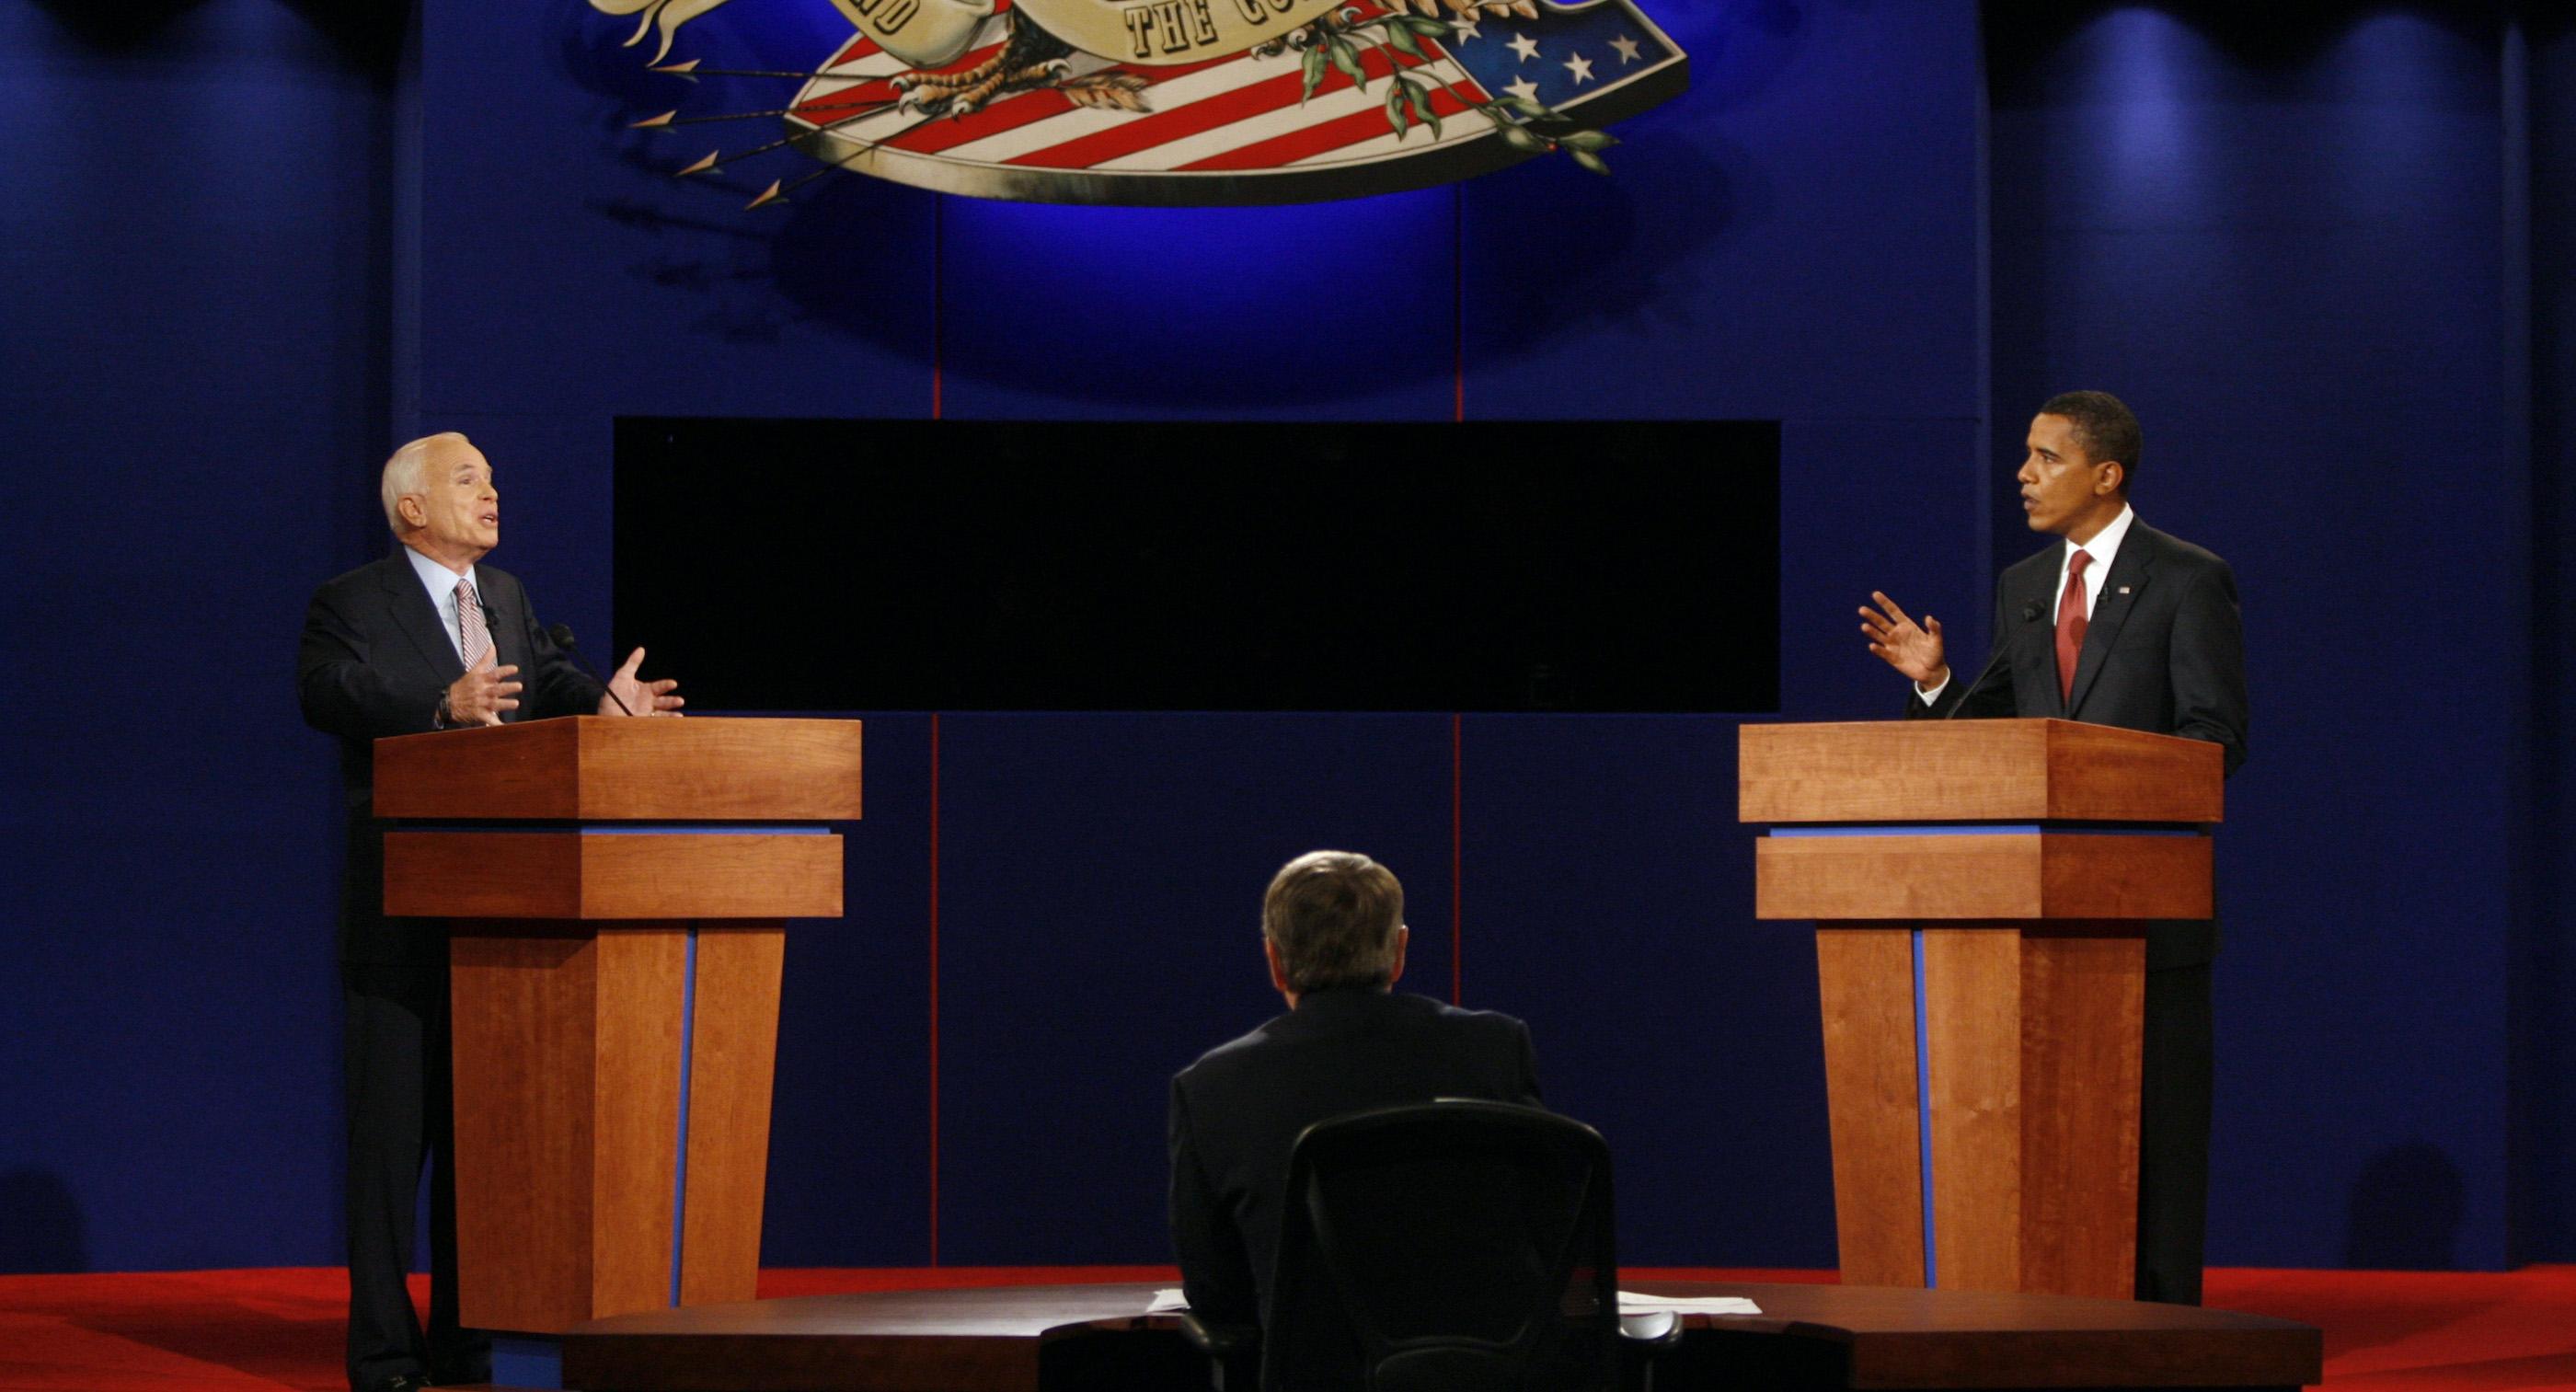 McCain vs. Obama: The first 2008 presidential debate